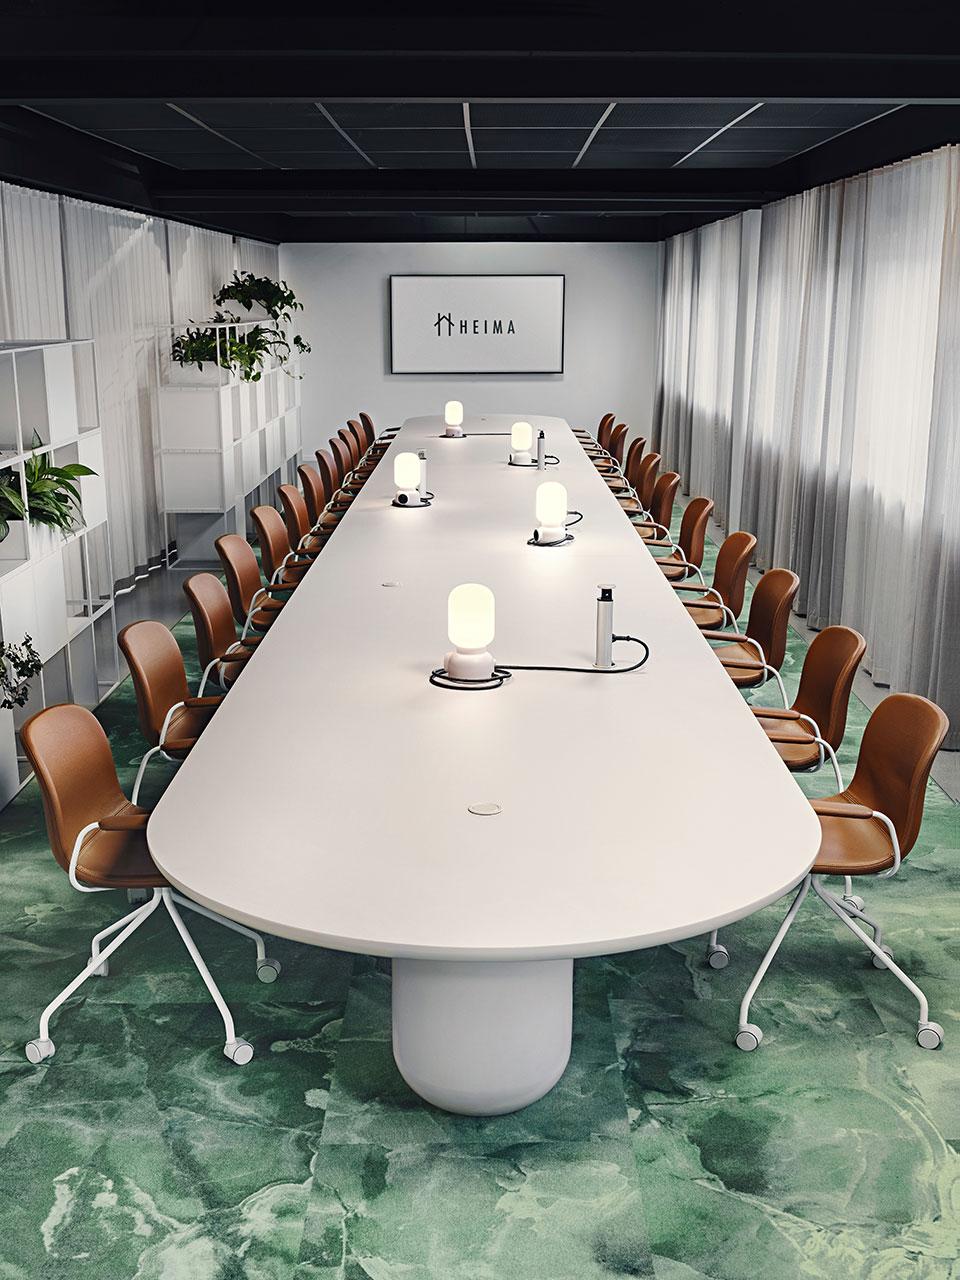 Creative bord på Heima kontorshotell